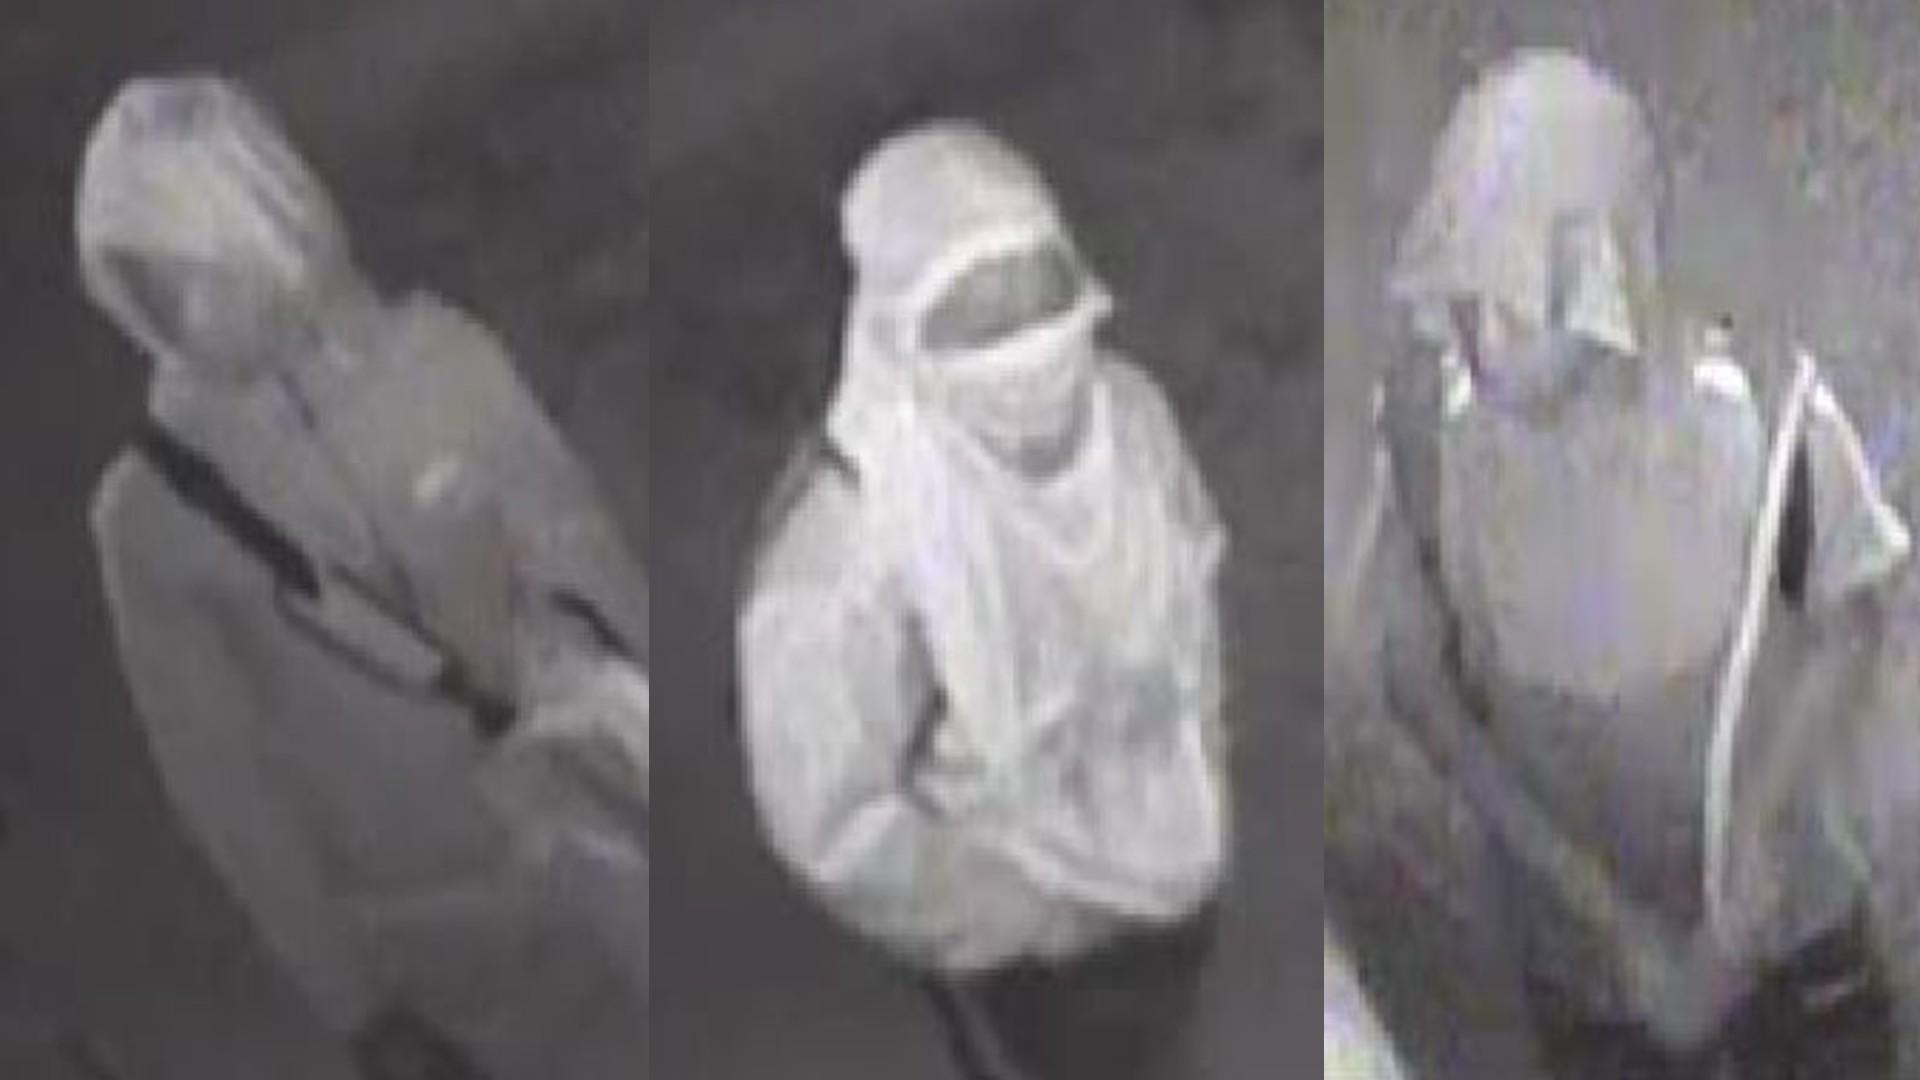 Milwaukee police seek public's help identifying burglary suspects